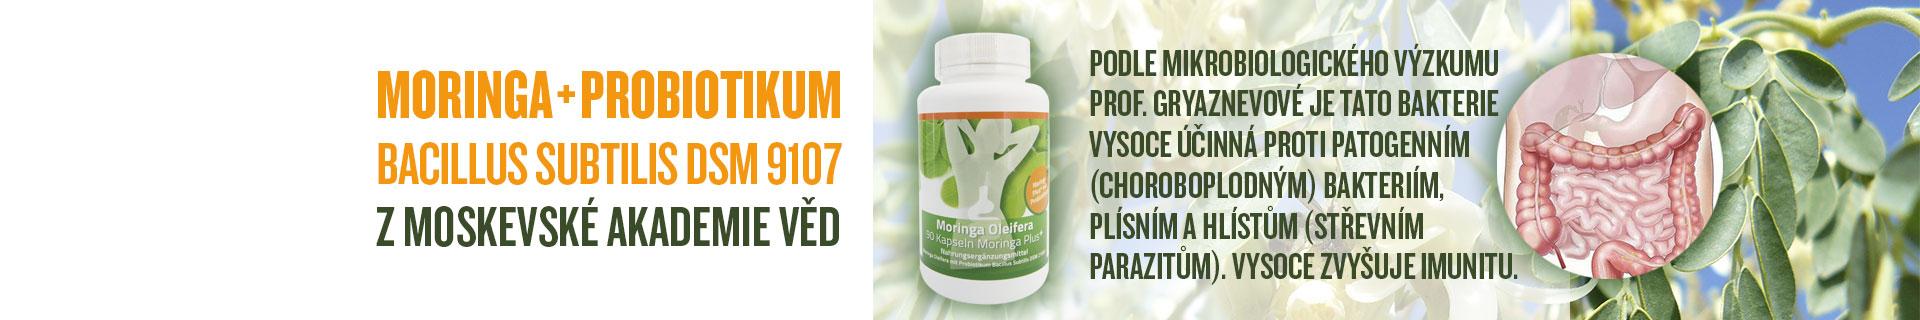 Moringa plus probiotikum